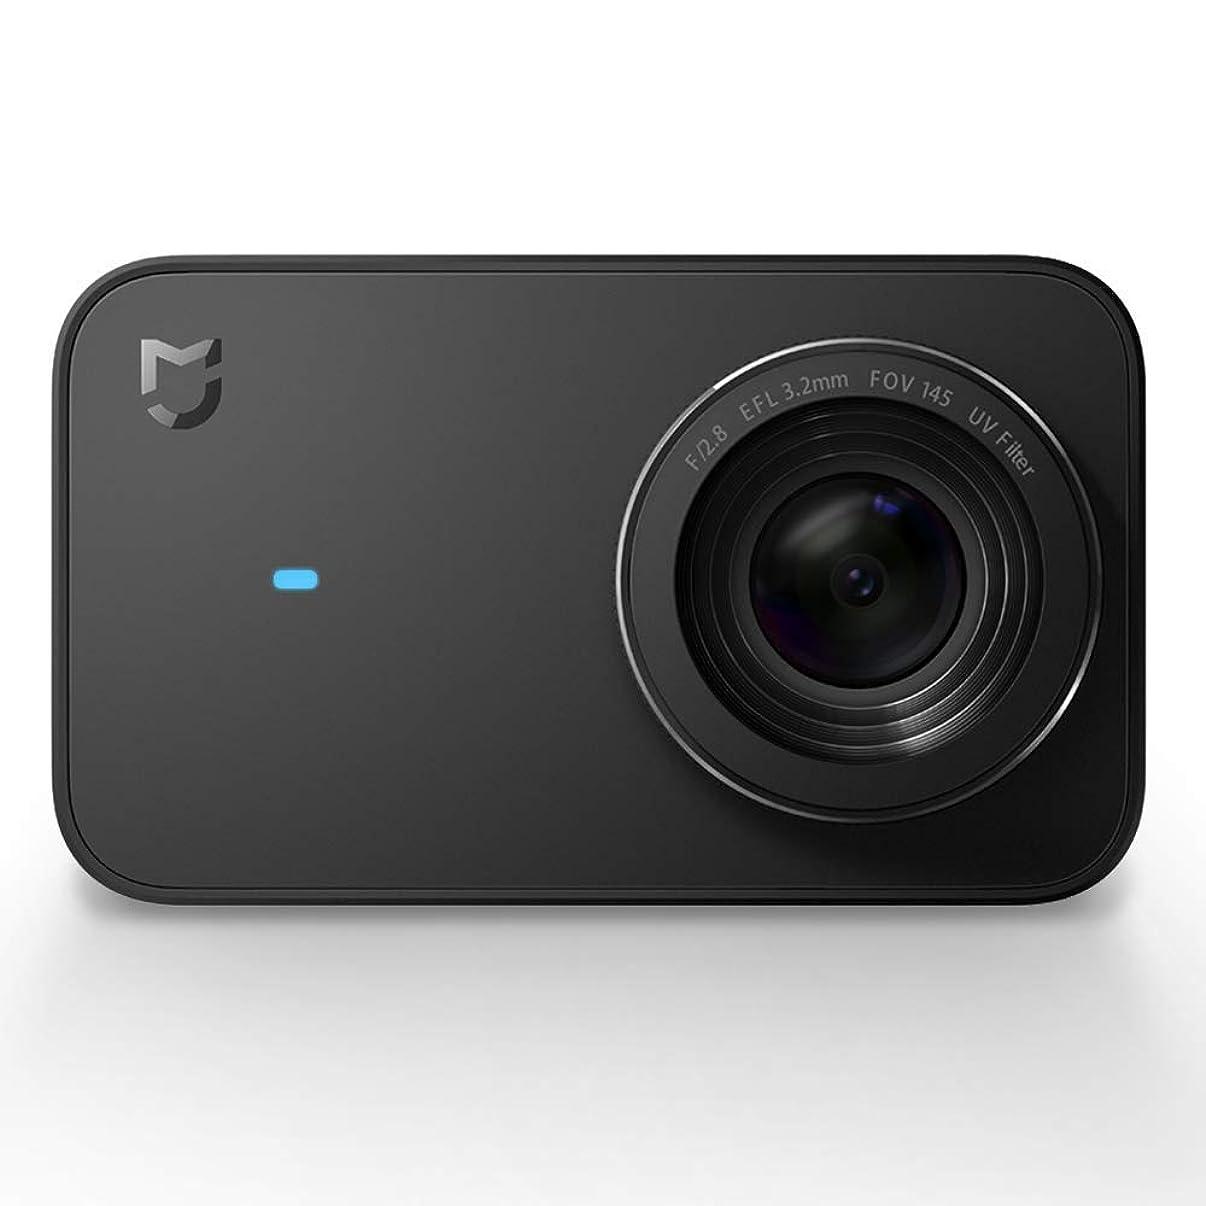 "MI Xiaomi 4K Action Camera, Mi Mijia 2.4"" Touchscreen WiFi IP67 Waterproof Sports Cam with Sony Image Senor, 145° Wide Angle 4K/30fps 1080P/100fps Video Raw Image"